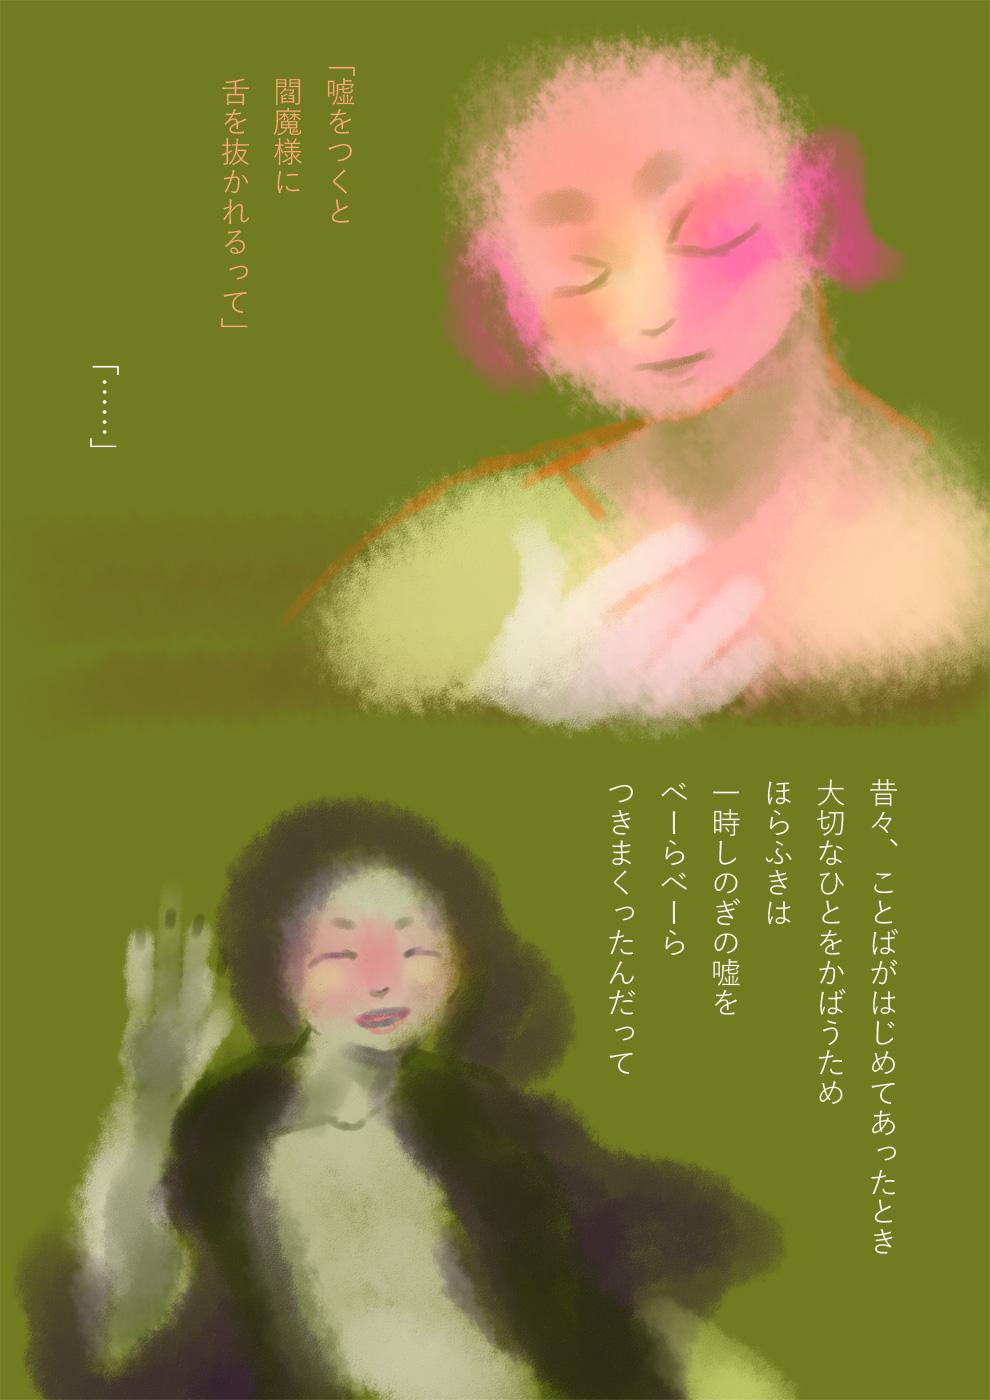 http://ahito.com/comic/ehon/voice/img/2018/20180323/01.jpg